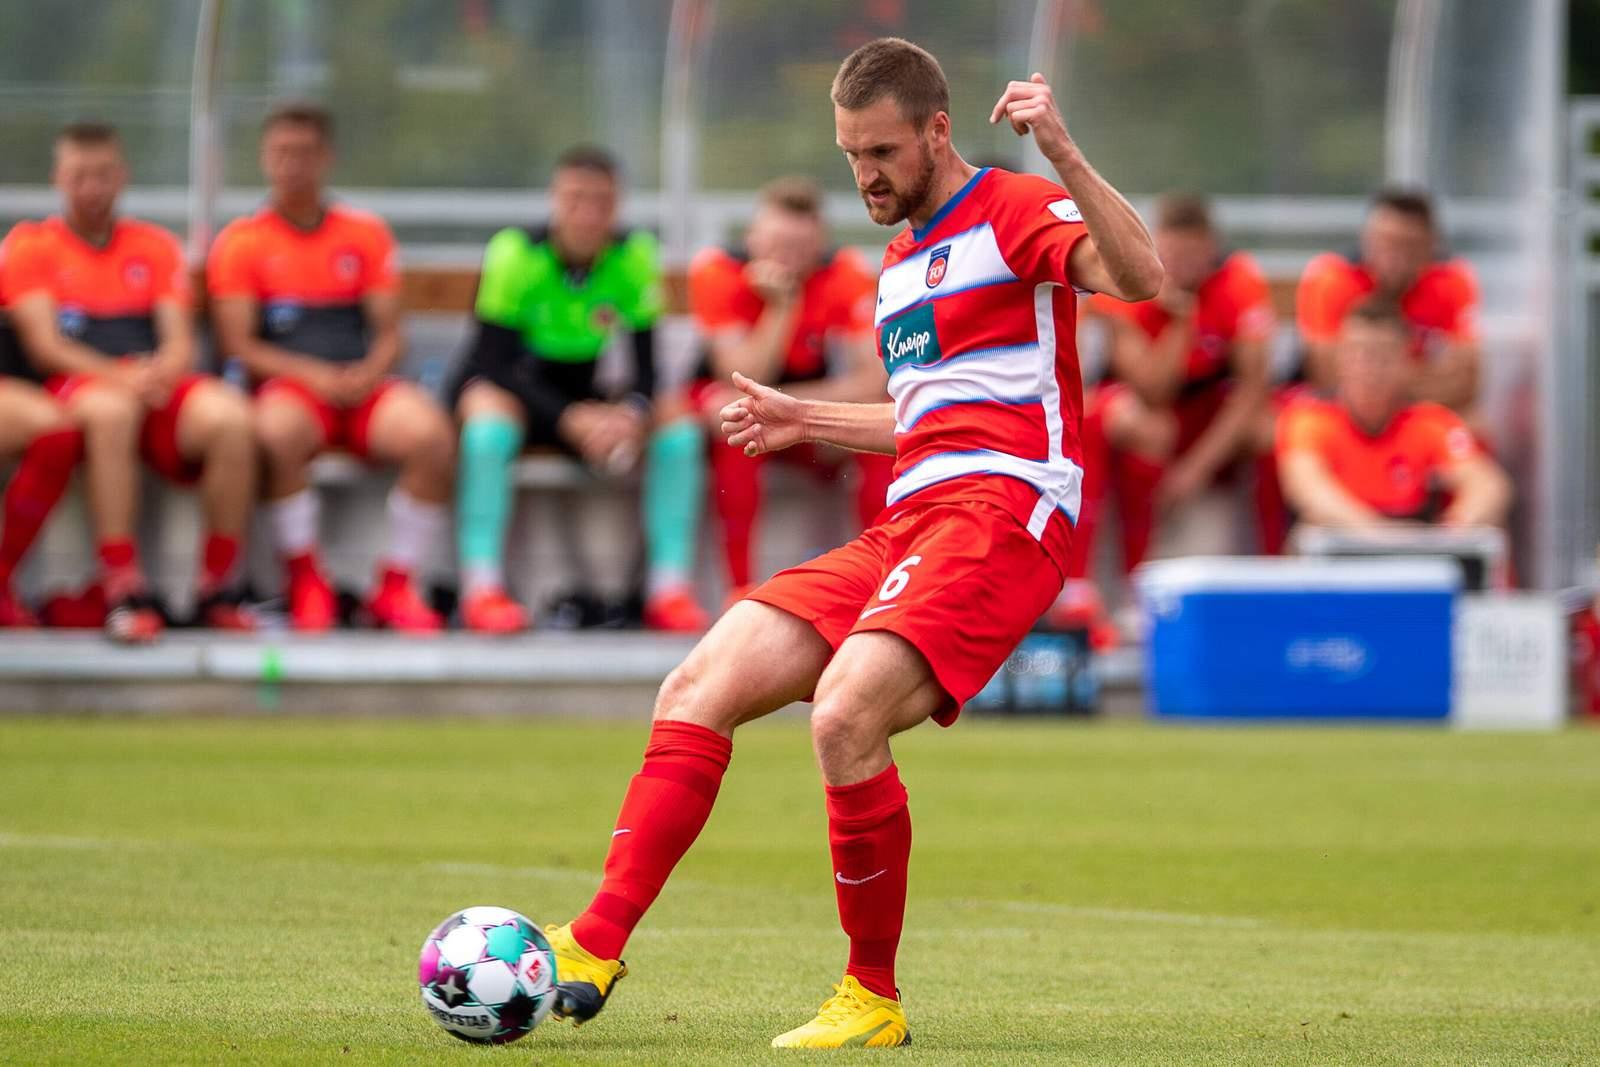 Patrick Mainka vom 1. FC Heidenheim